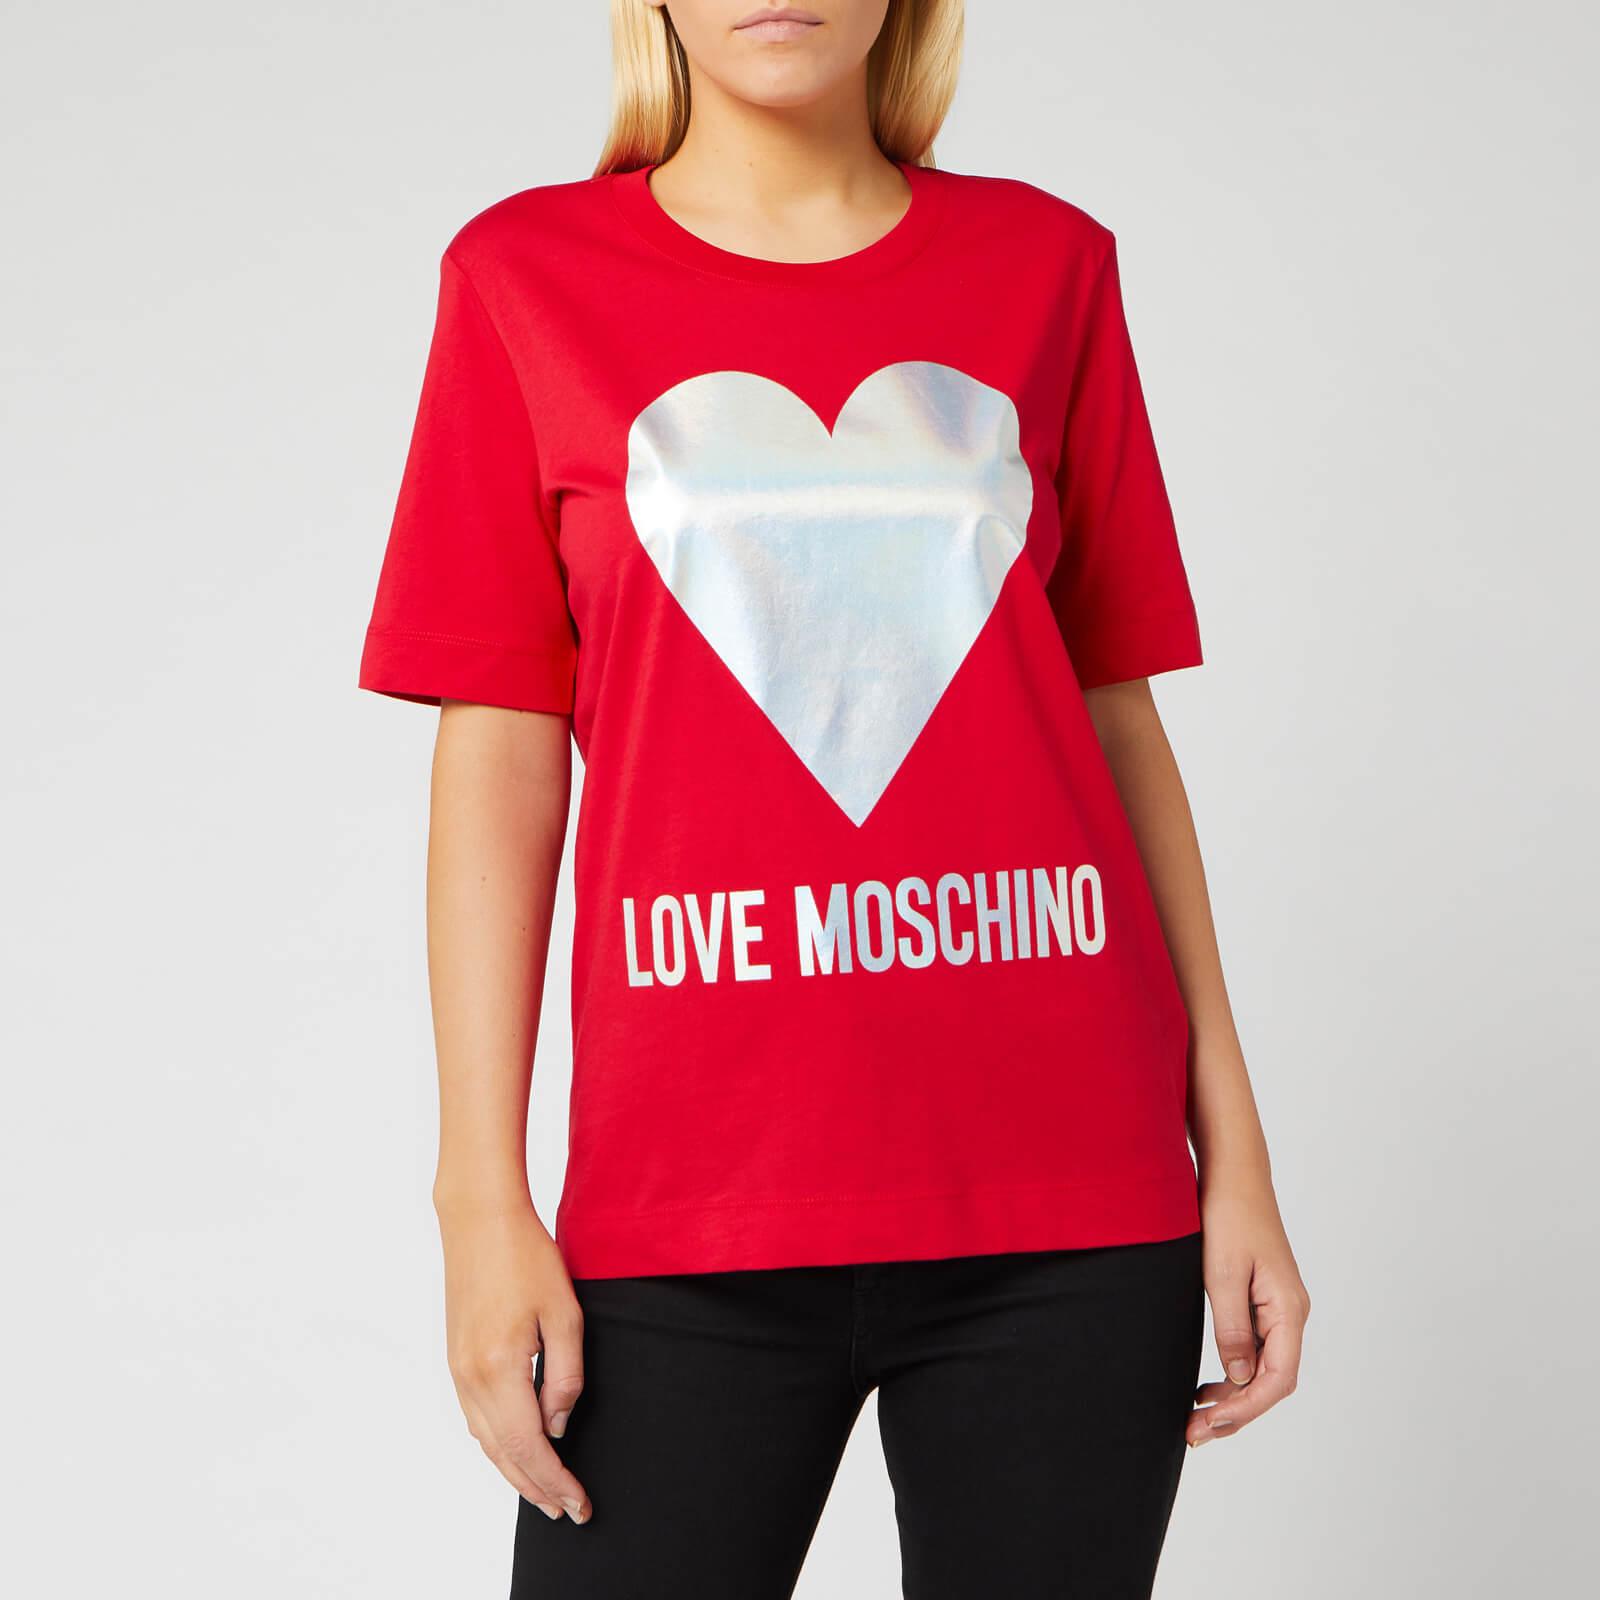 Moschino Love Moschino Women's Silver Heart T-Shirt - Red - IT 40/UK 8